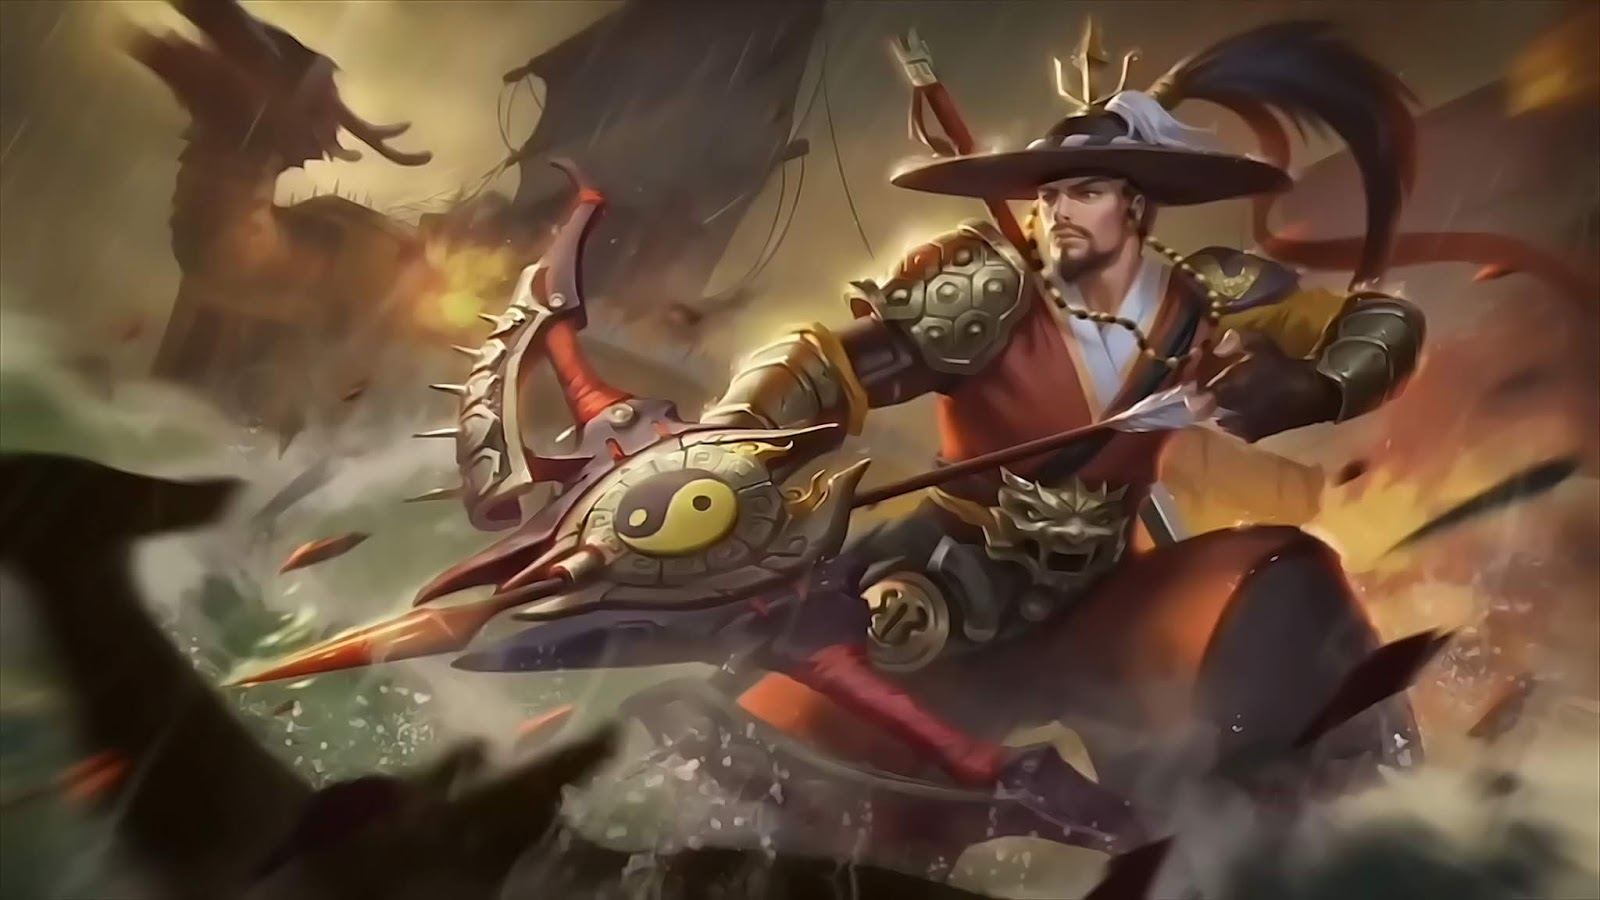 Wallpaper Yi Sun-Shin National Hero Skin Mobile Legends Full HD for PC